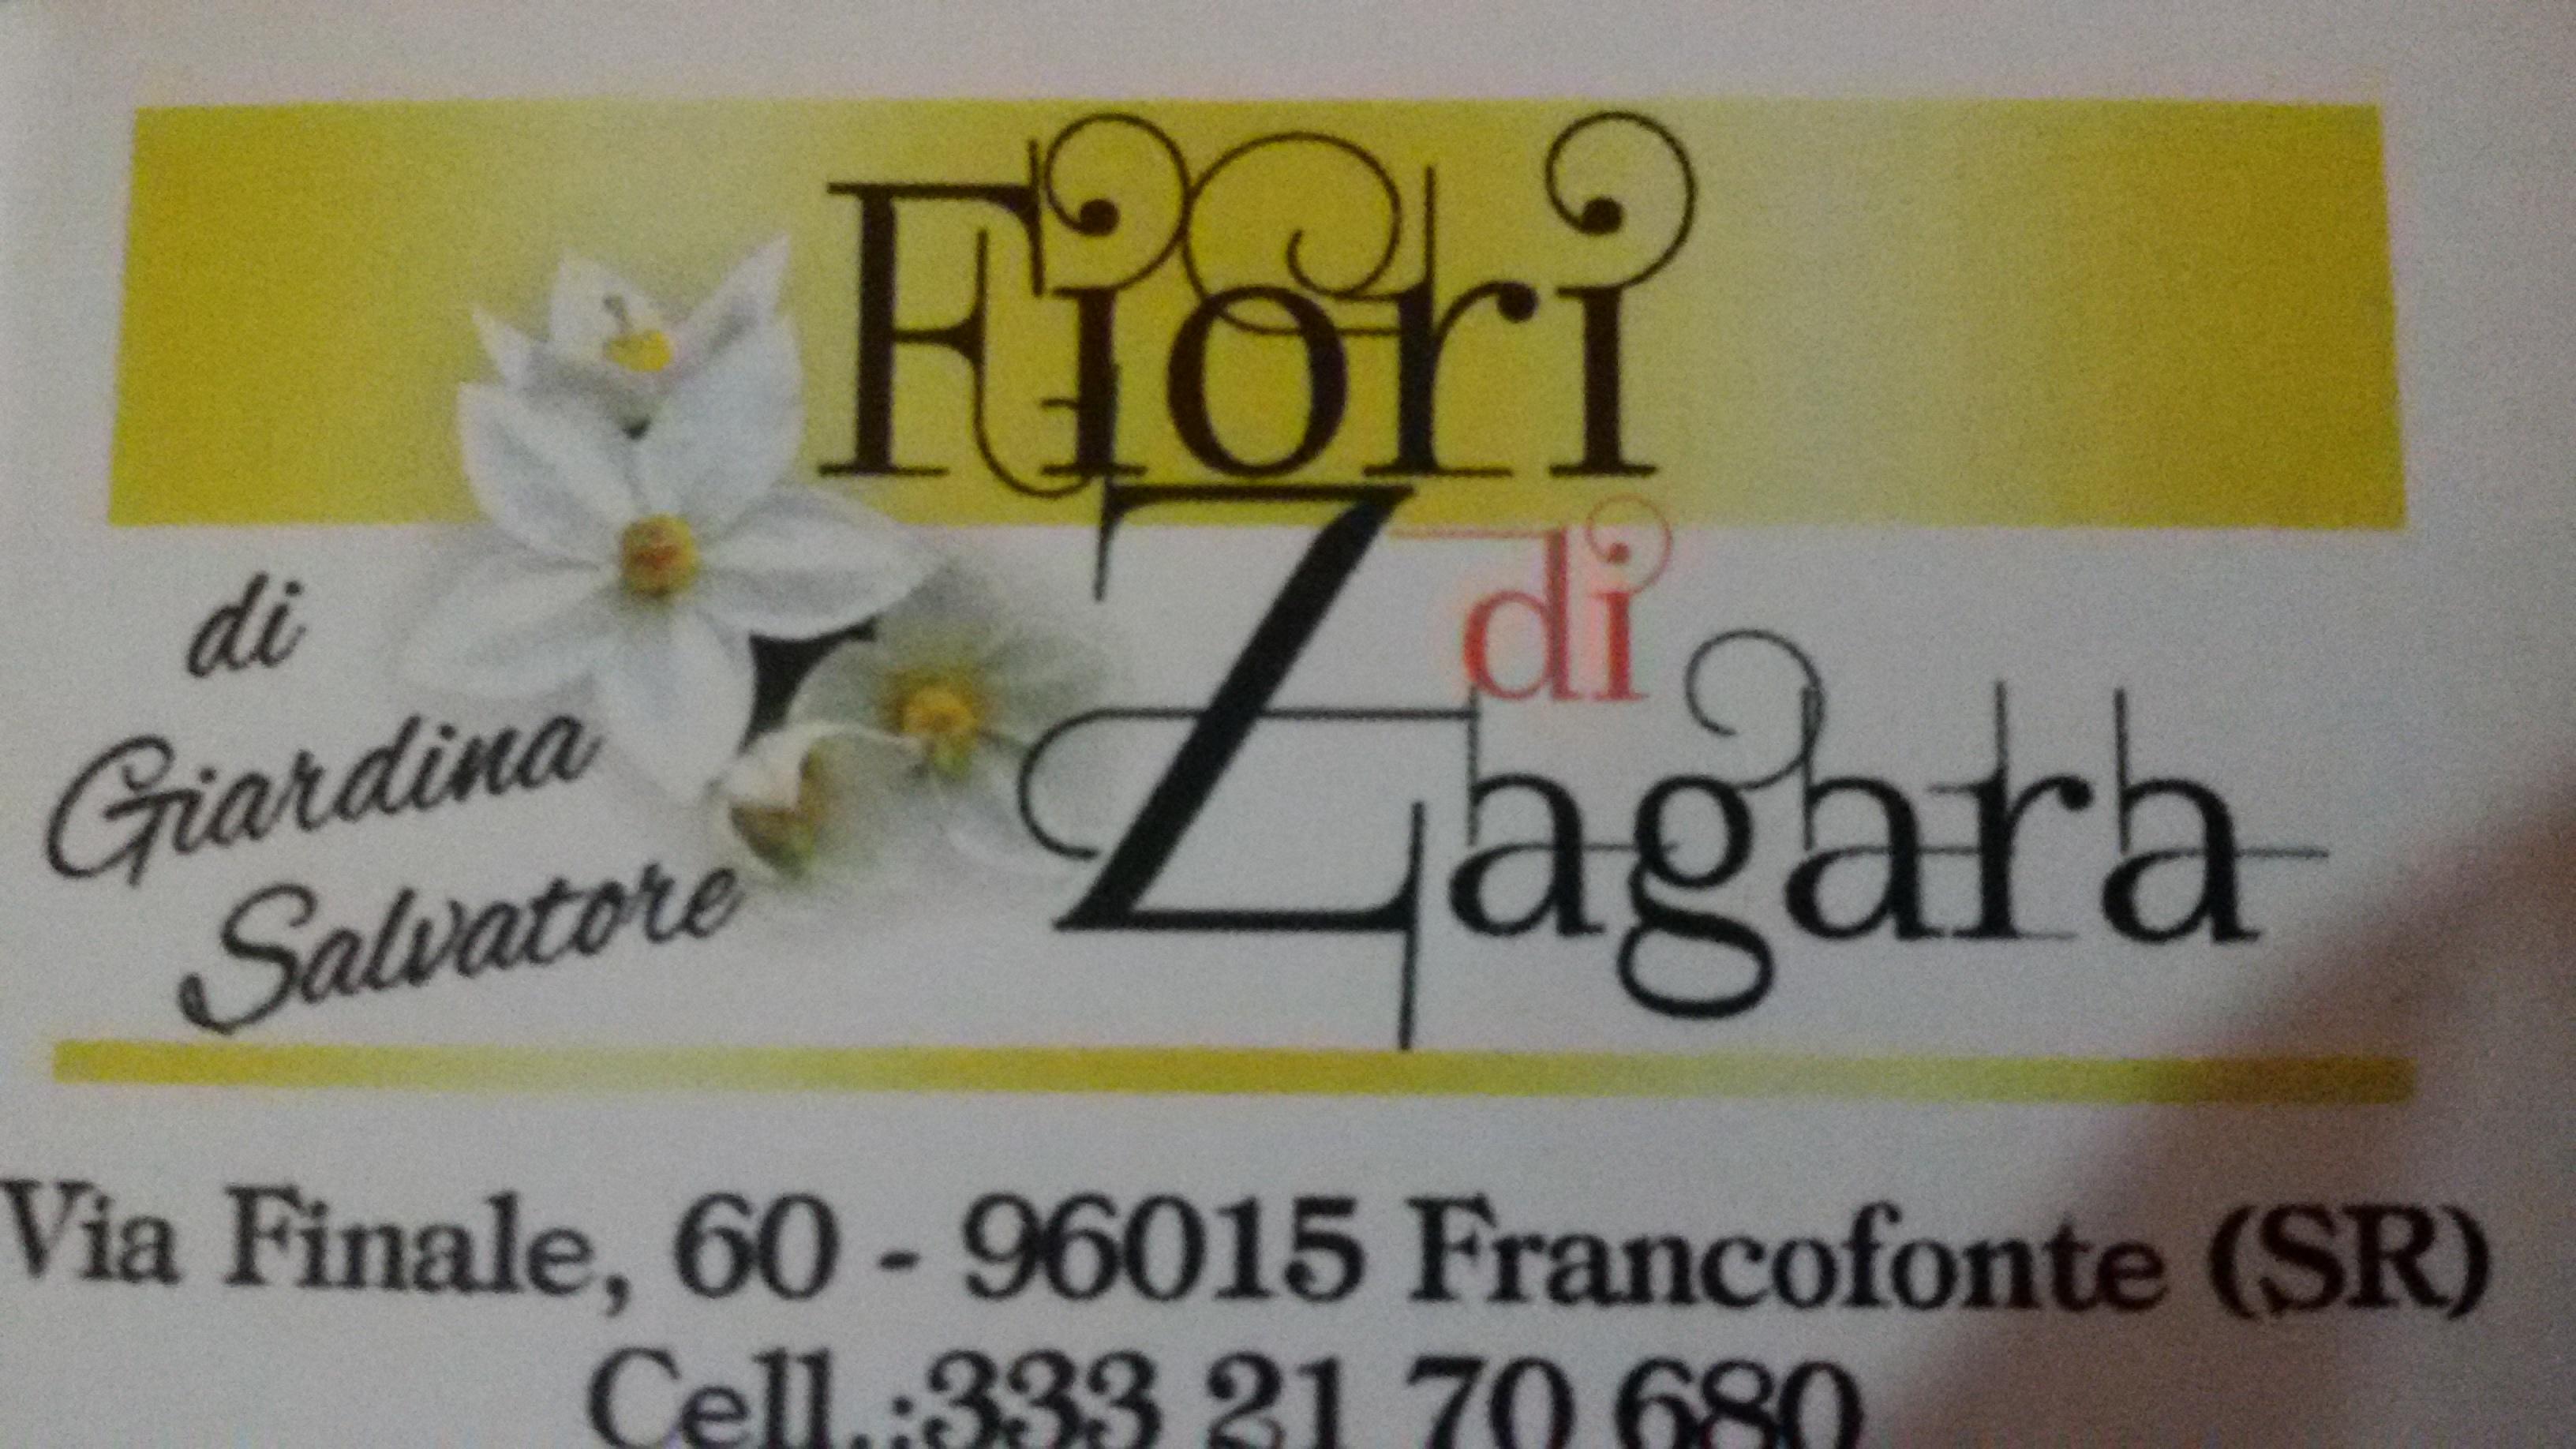 Logo Fiori di Zagara